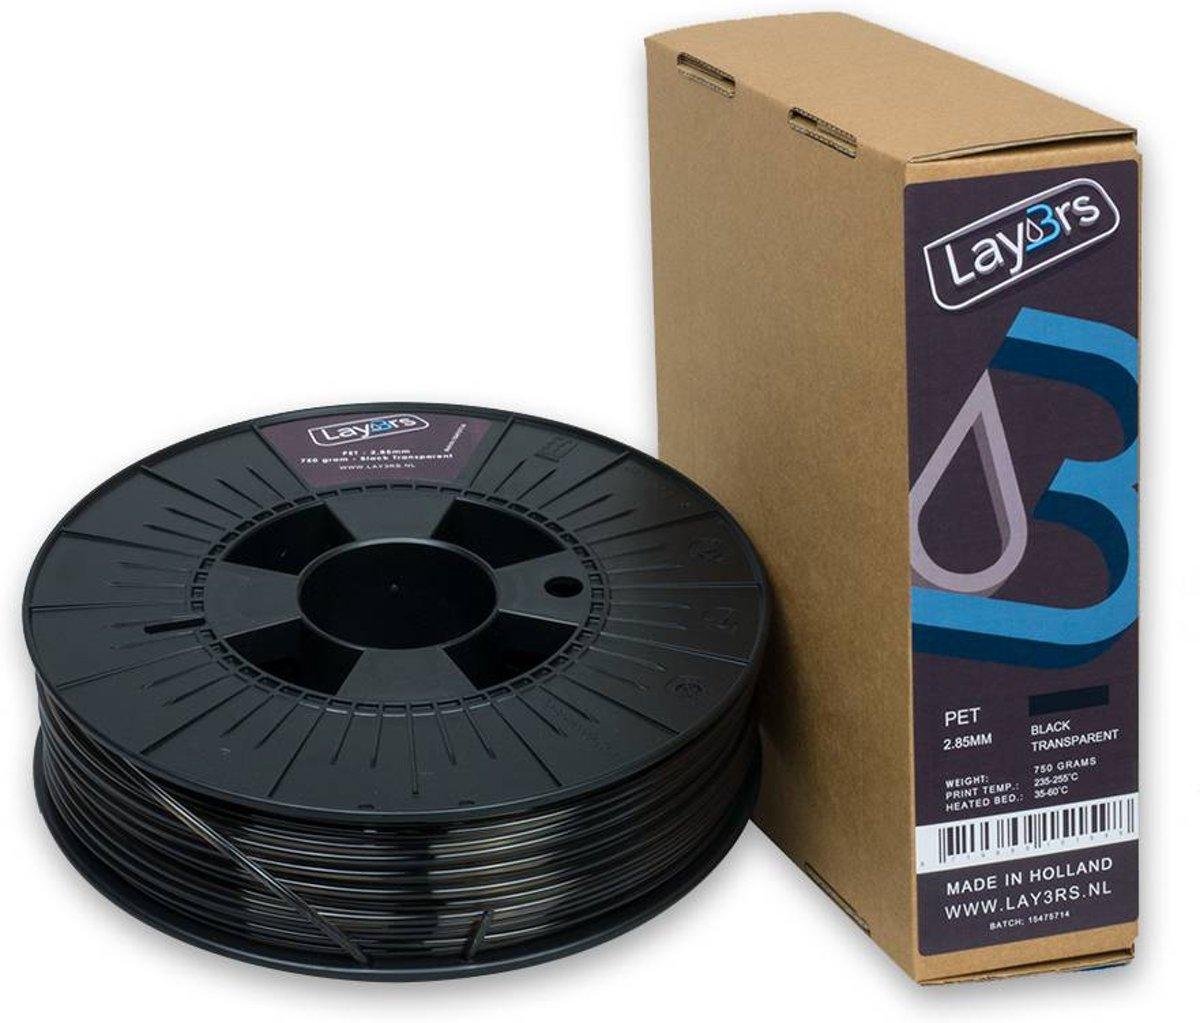 Lay3rs PET-G Black Transparent - 2.85 mm